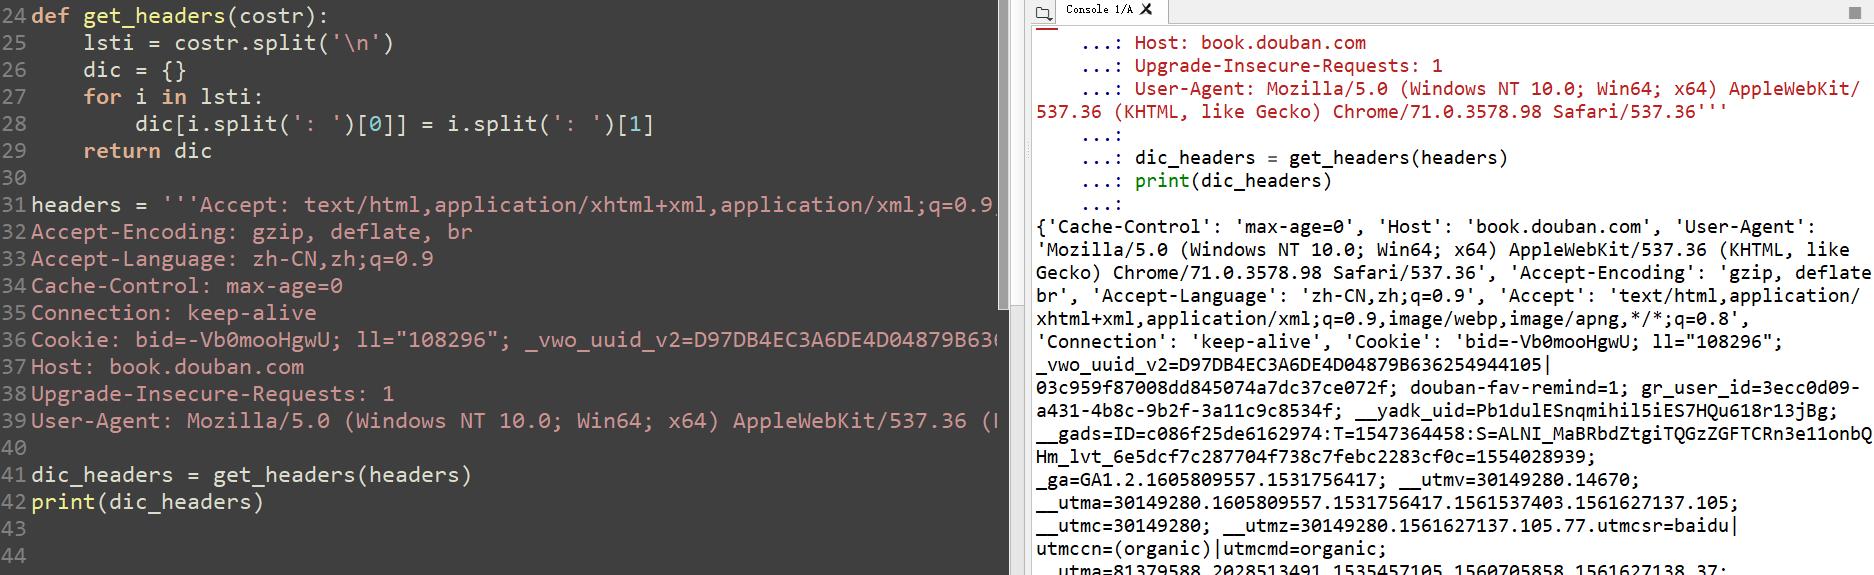 【爬虫基础】requests工具的使用-icbug创客